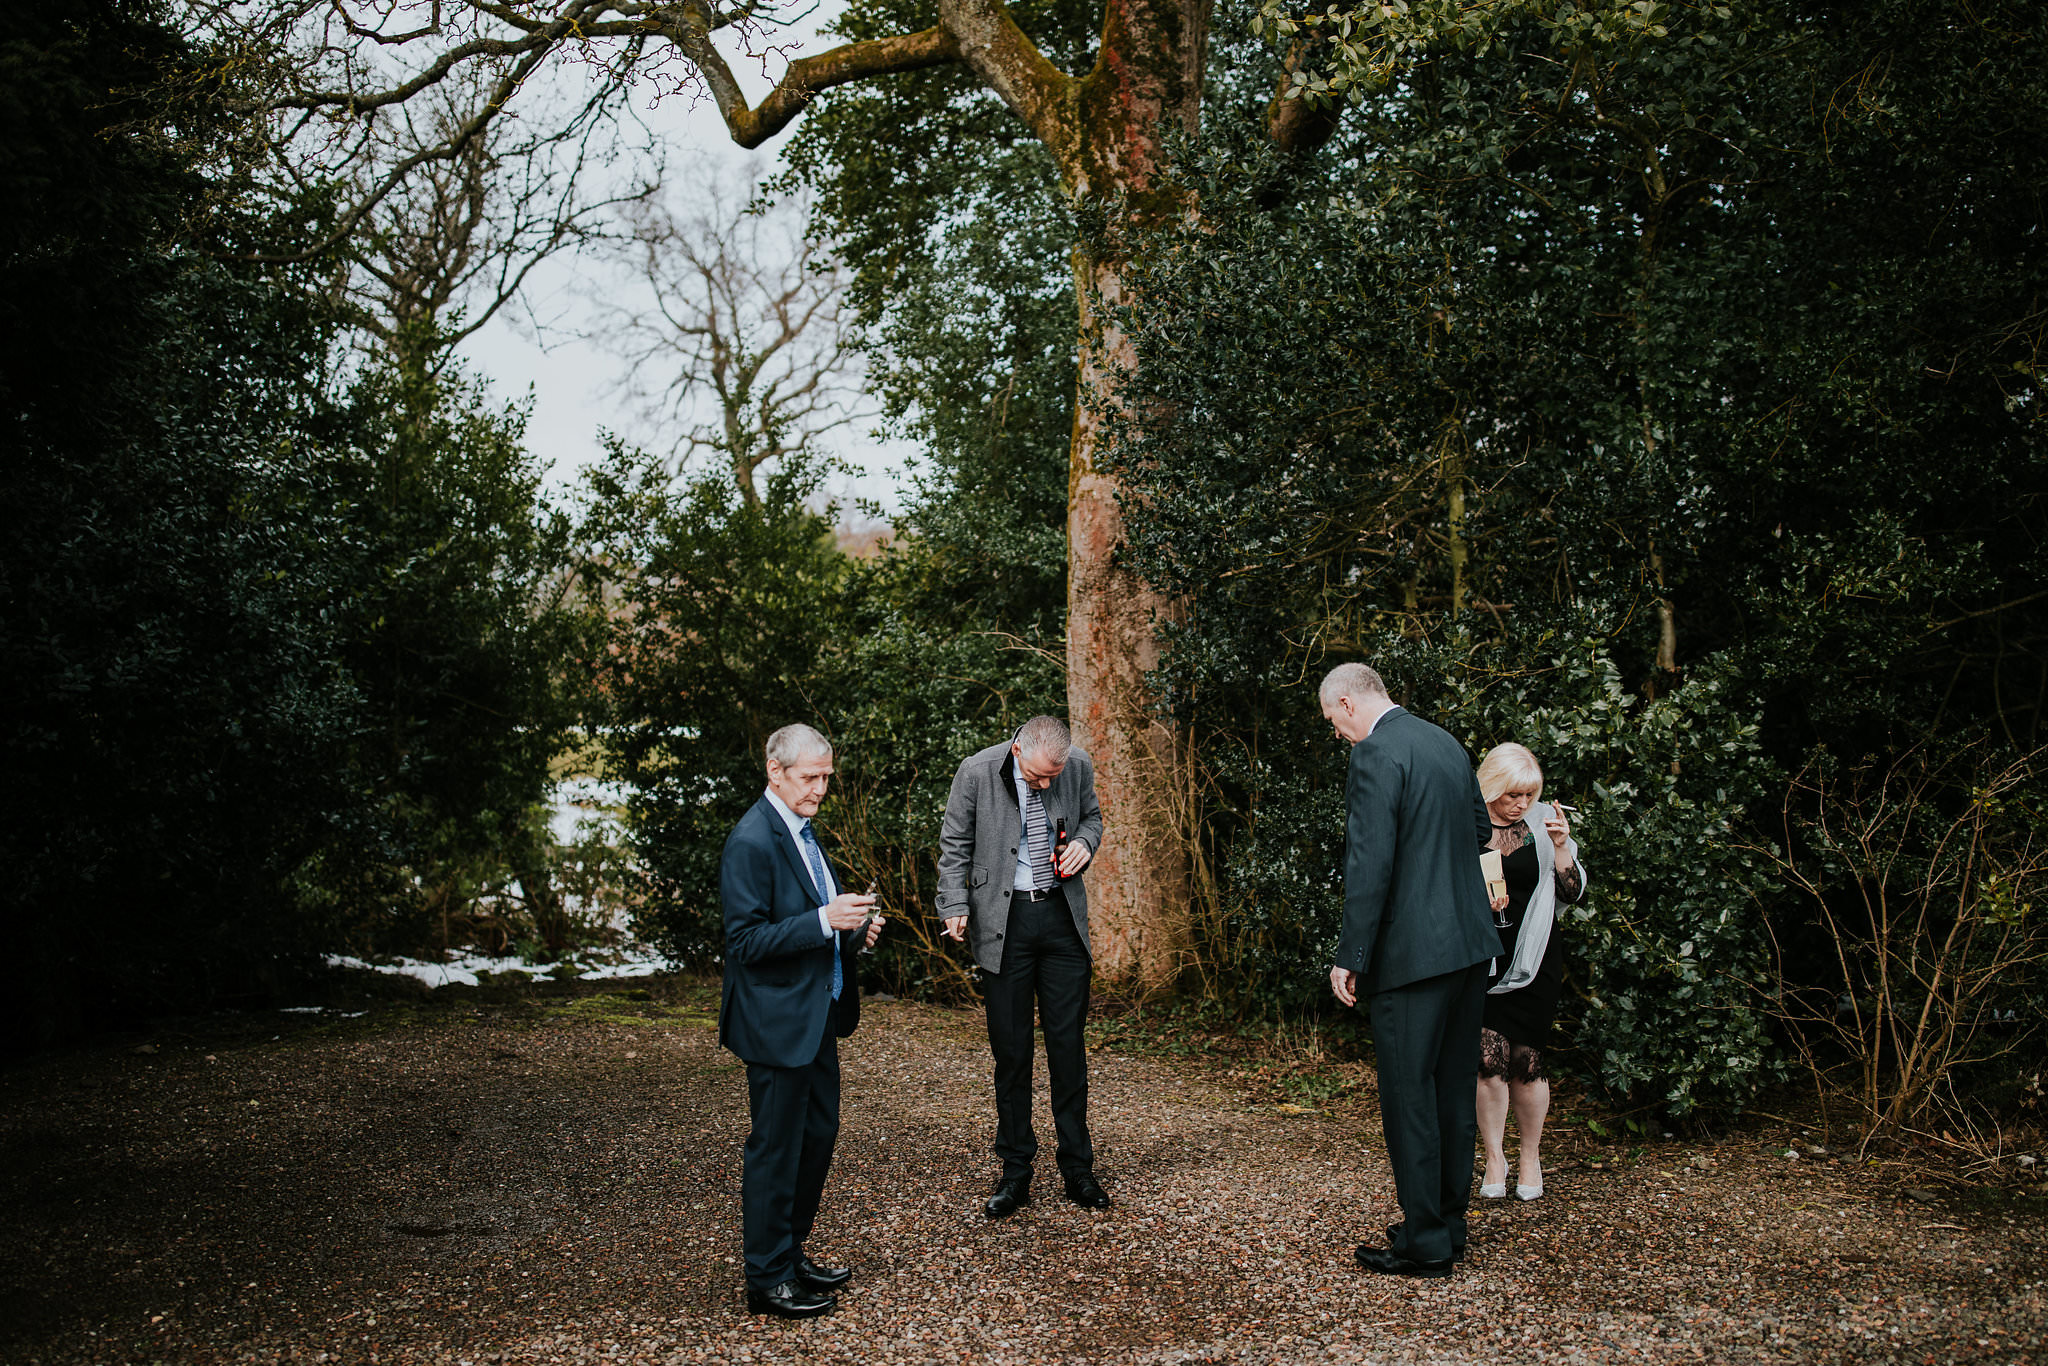 kirknewton stables wedding photographer (45).jpg